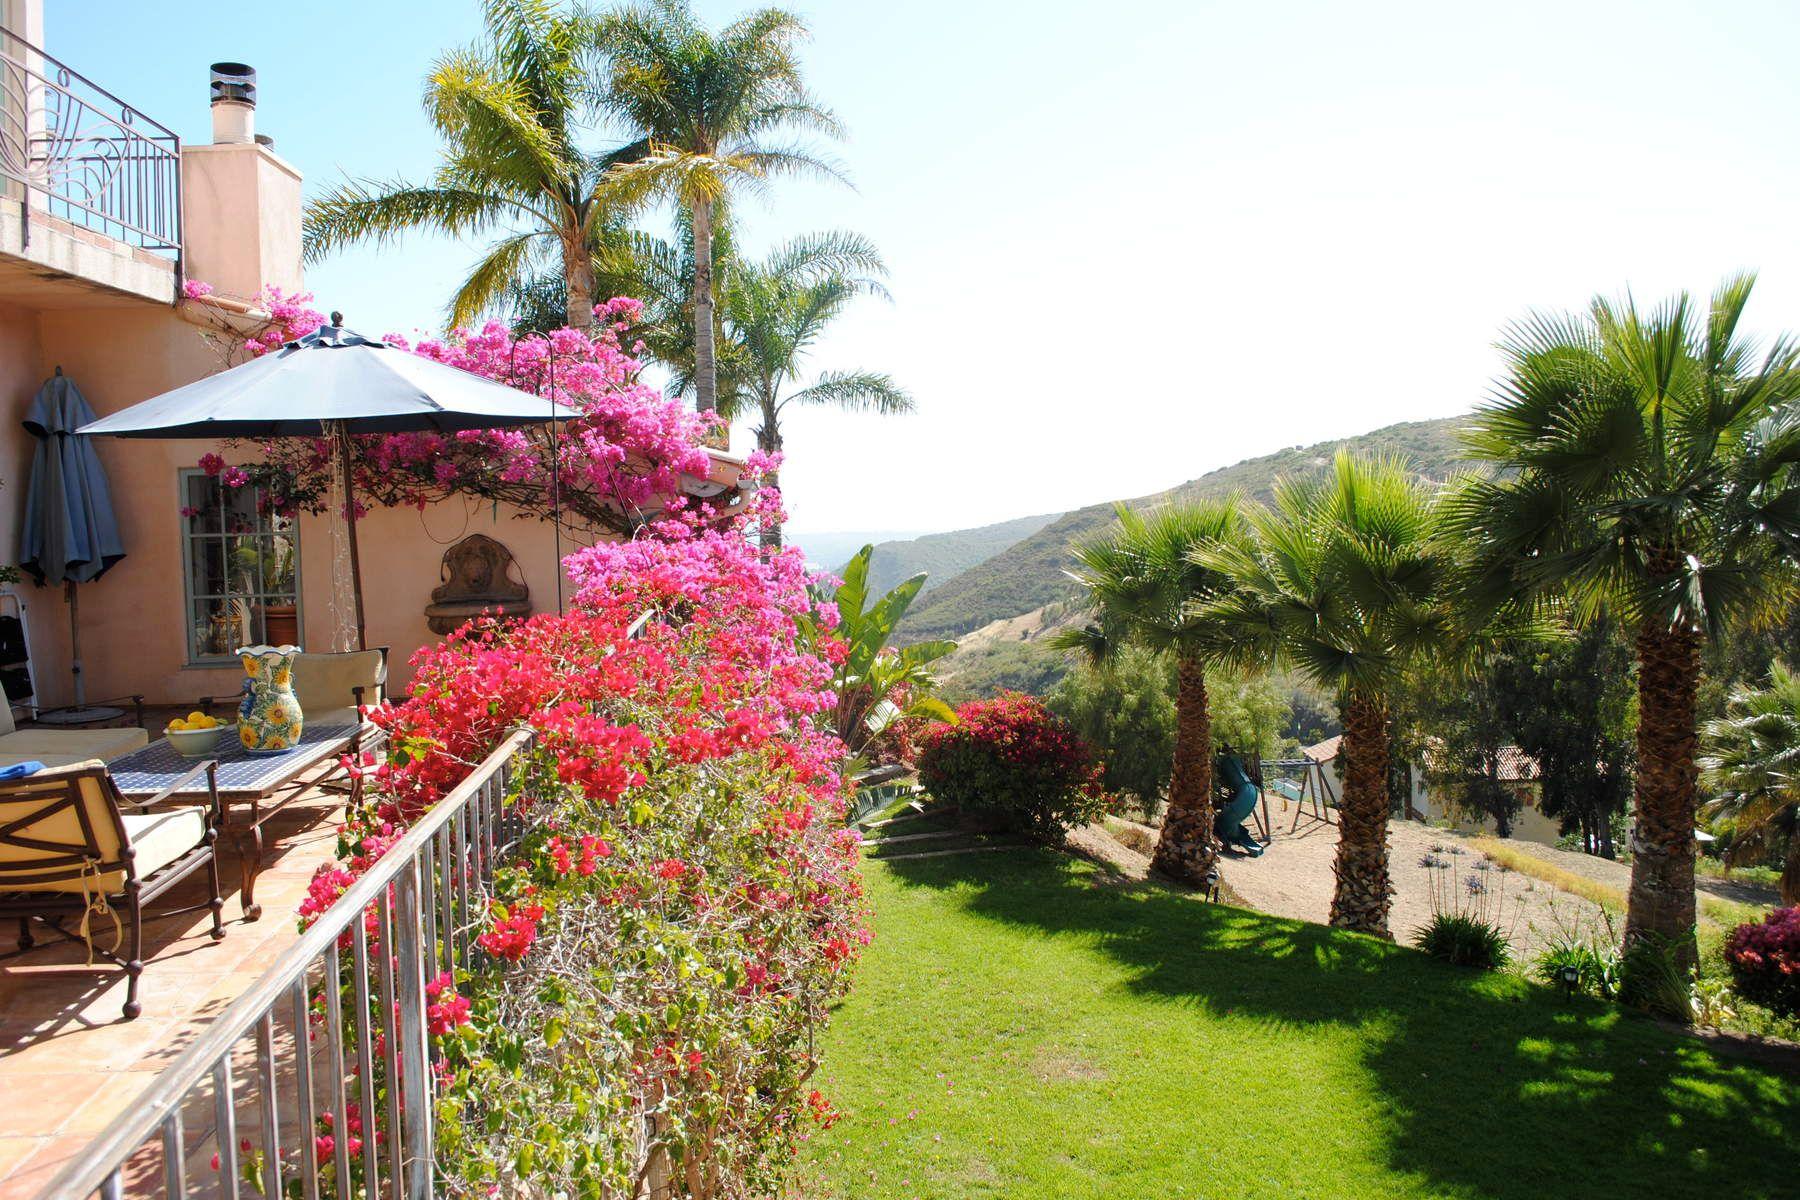 Single Family Home for Sale at 2900 Valmere Drive Malibu, California, 90265 United States